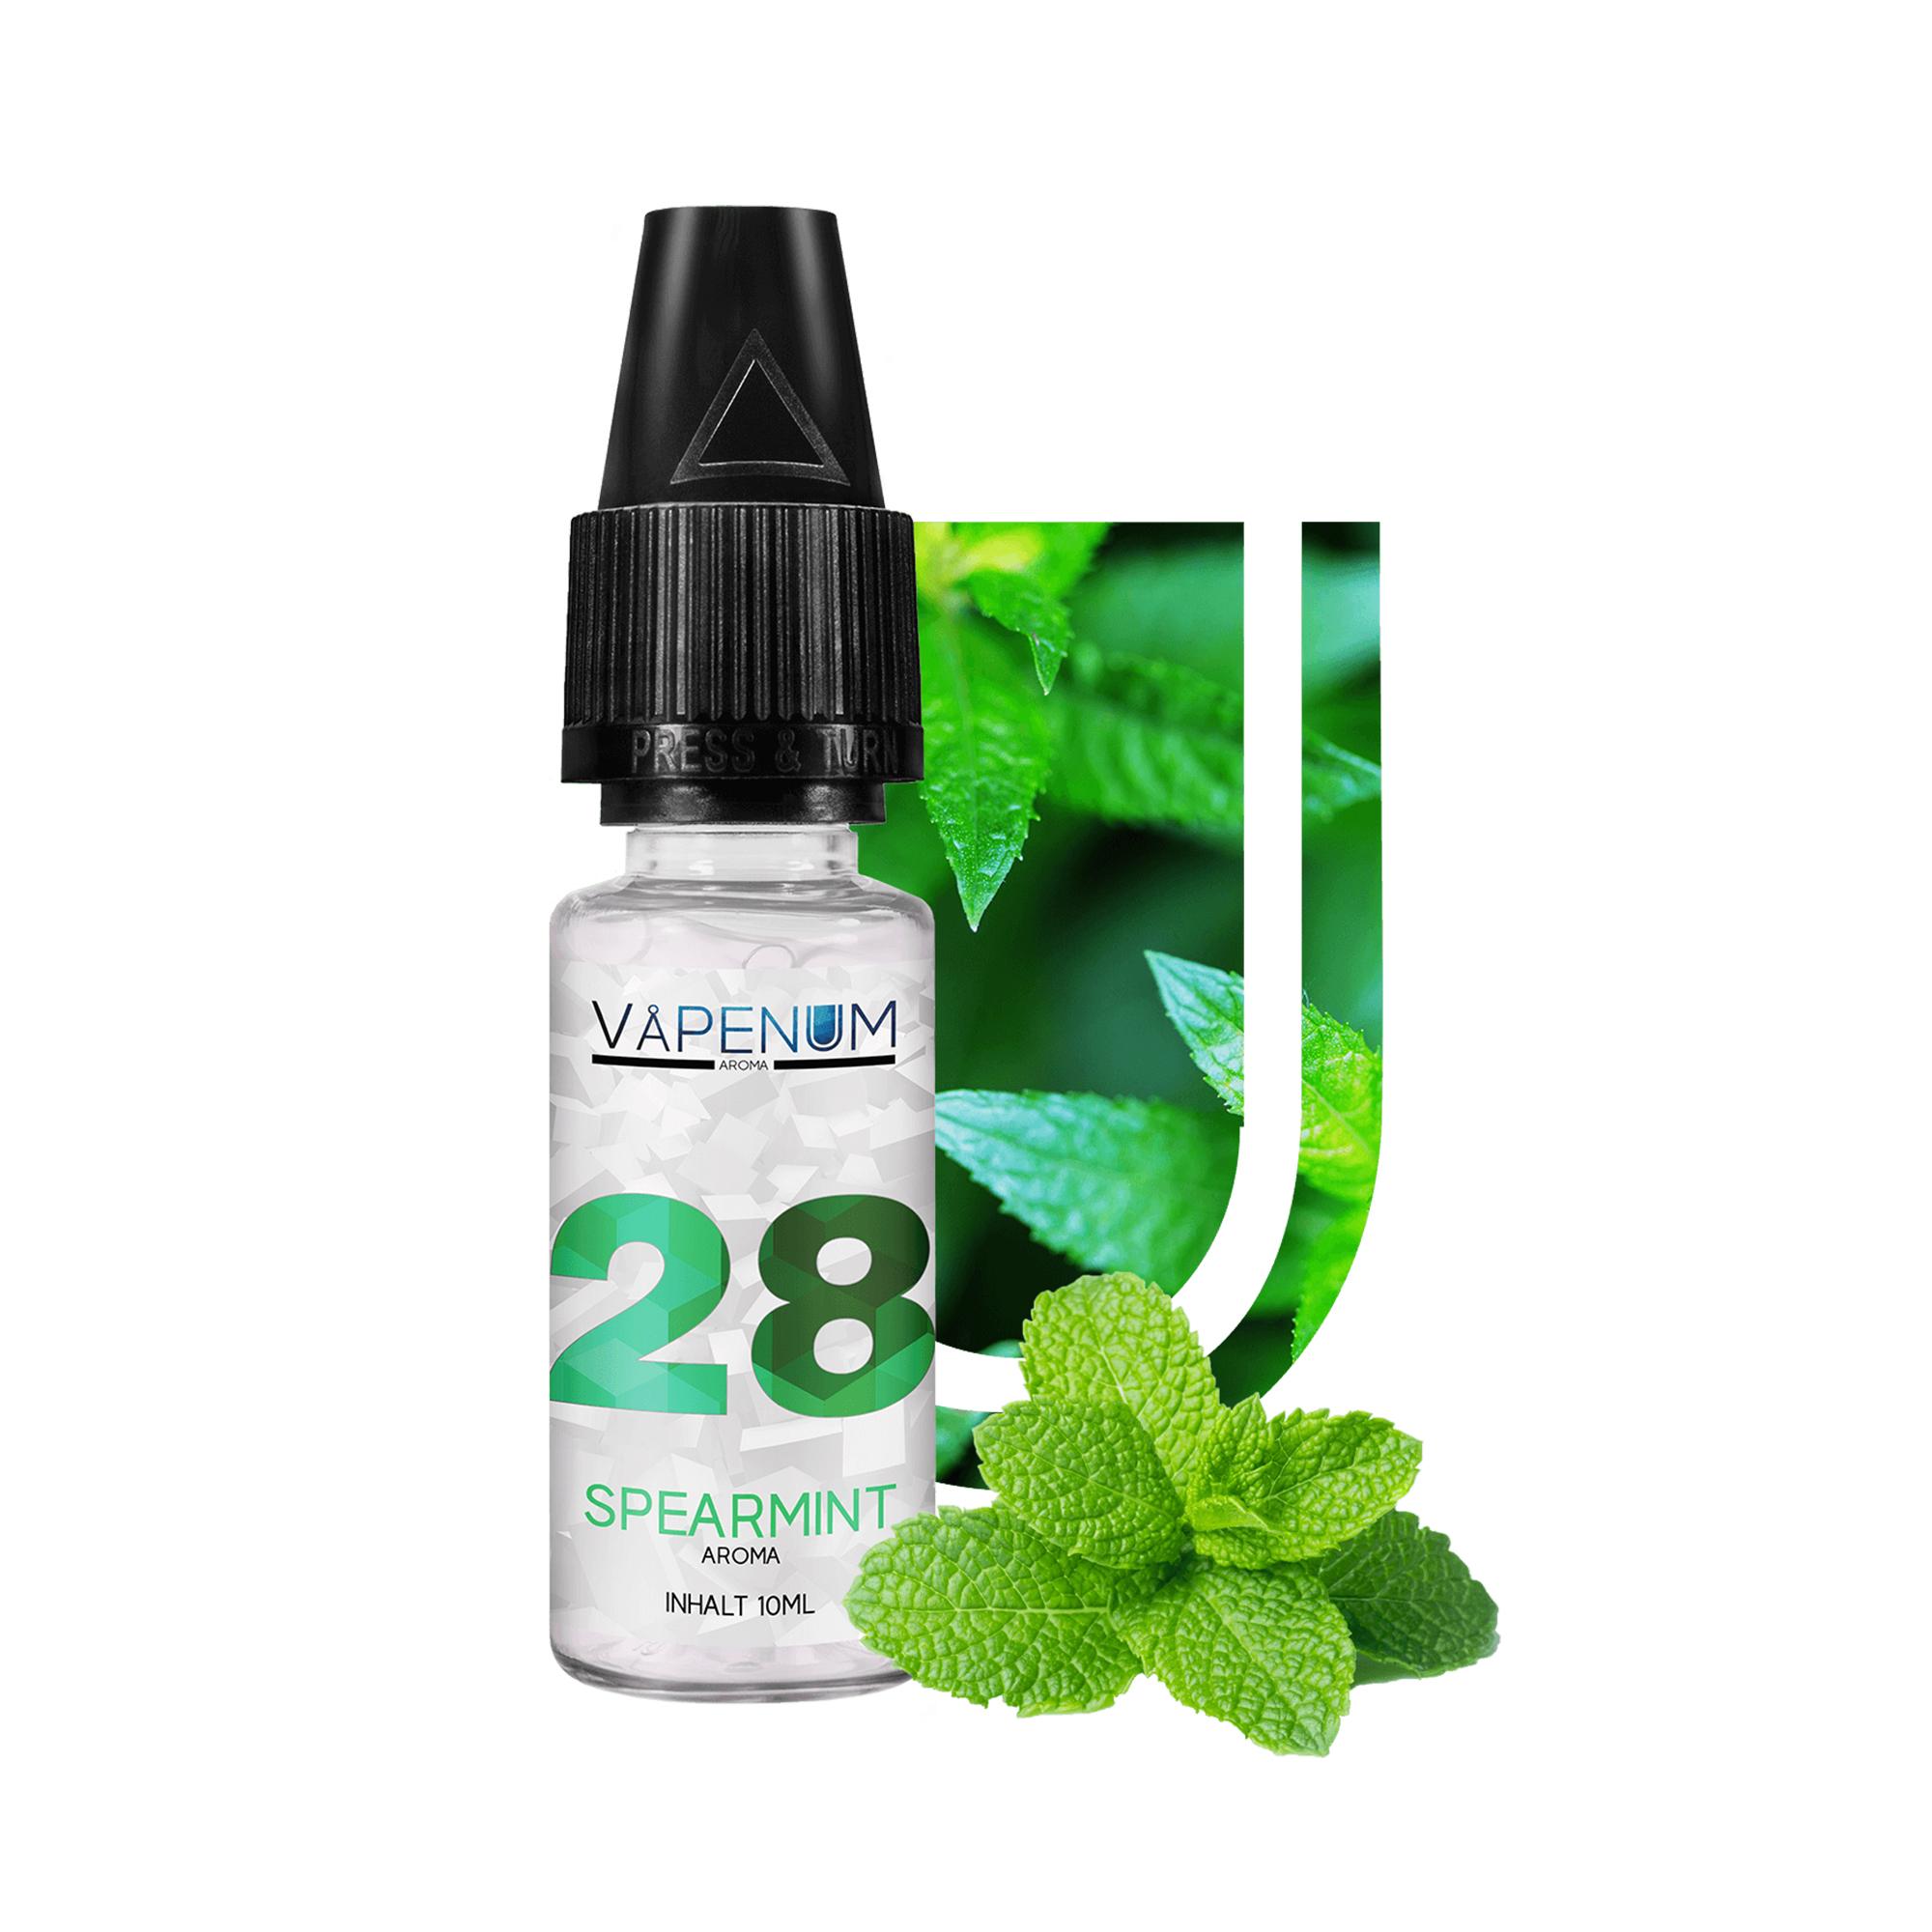 28 - Spearmint Aroma by Vapenum